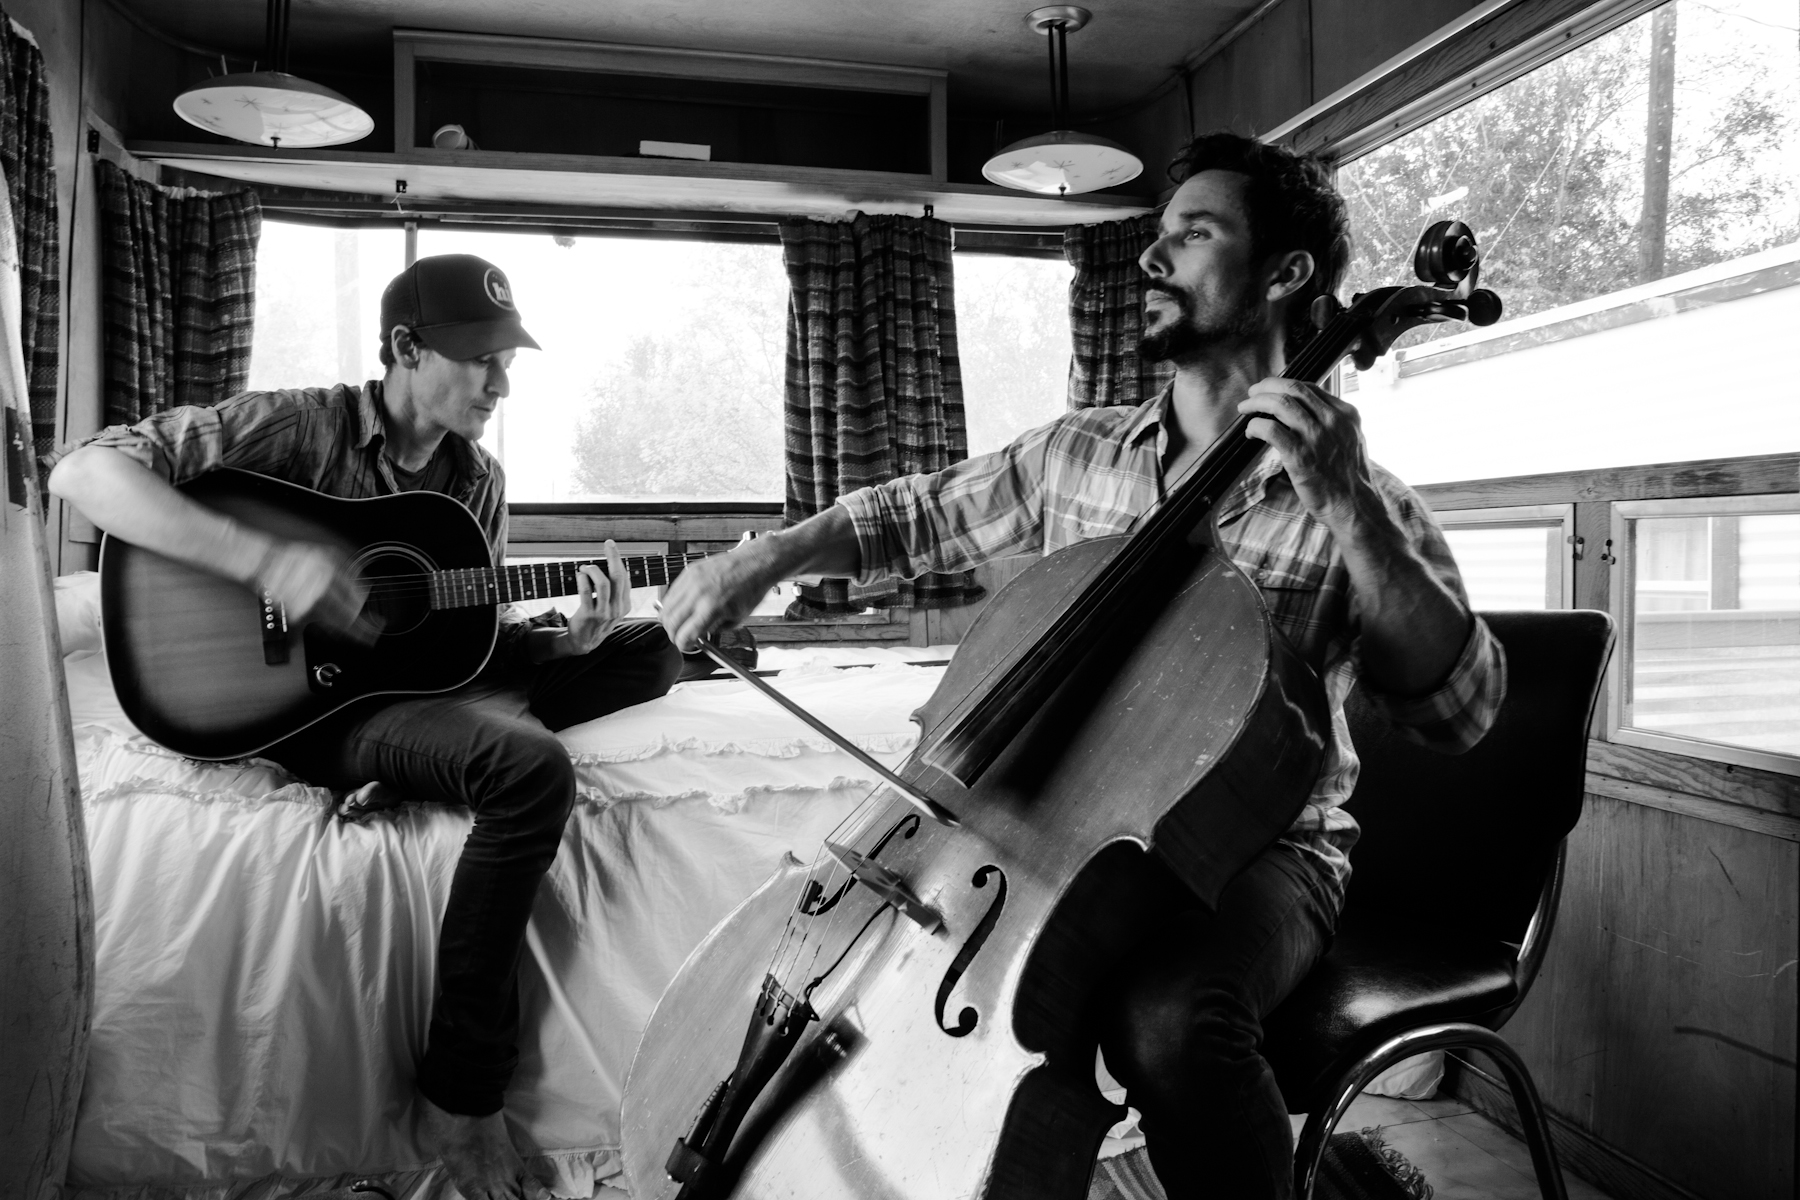 Rehearsing cello parts in the airstream with Joseph Santori.